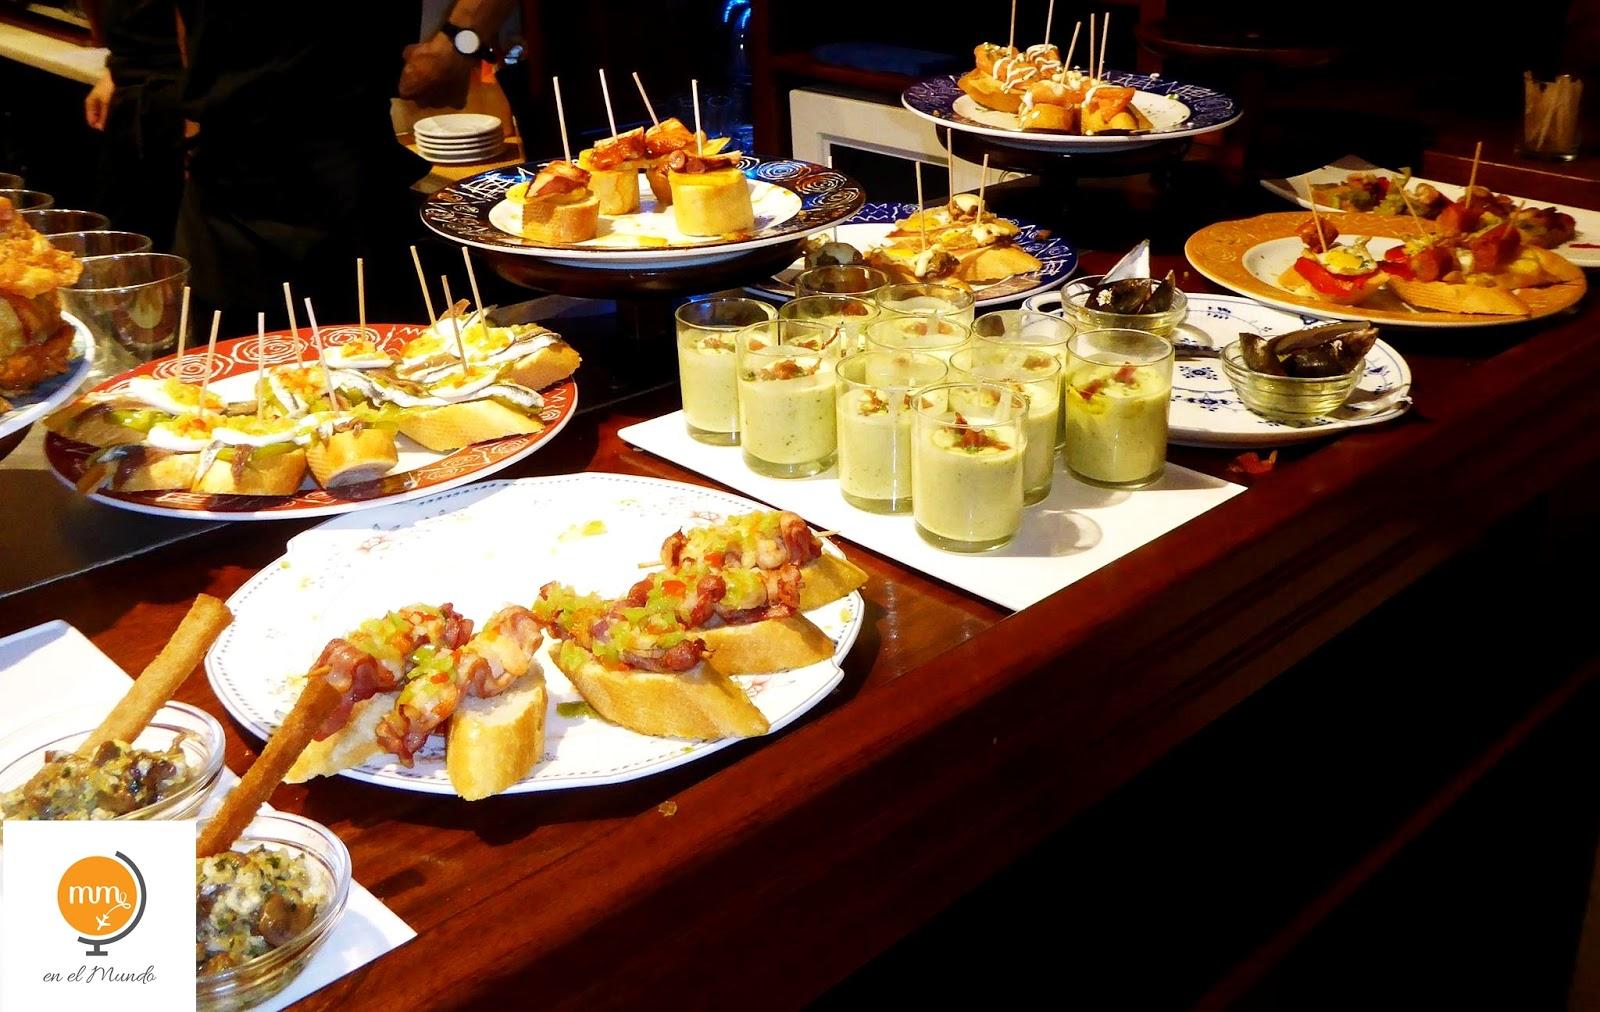 Hiszpania: Kraj Basków od kuchni! San Sebastian  - musisz tu zjeść!